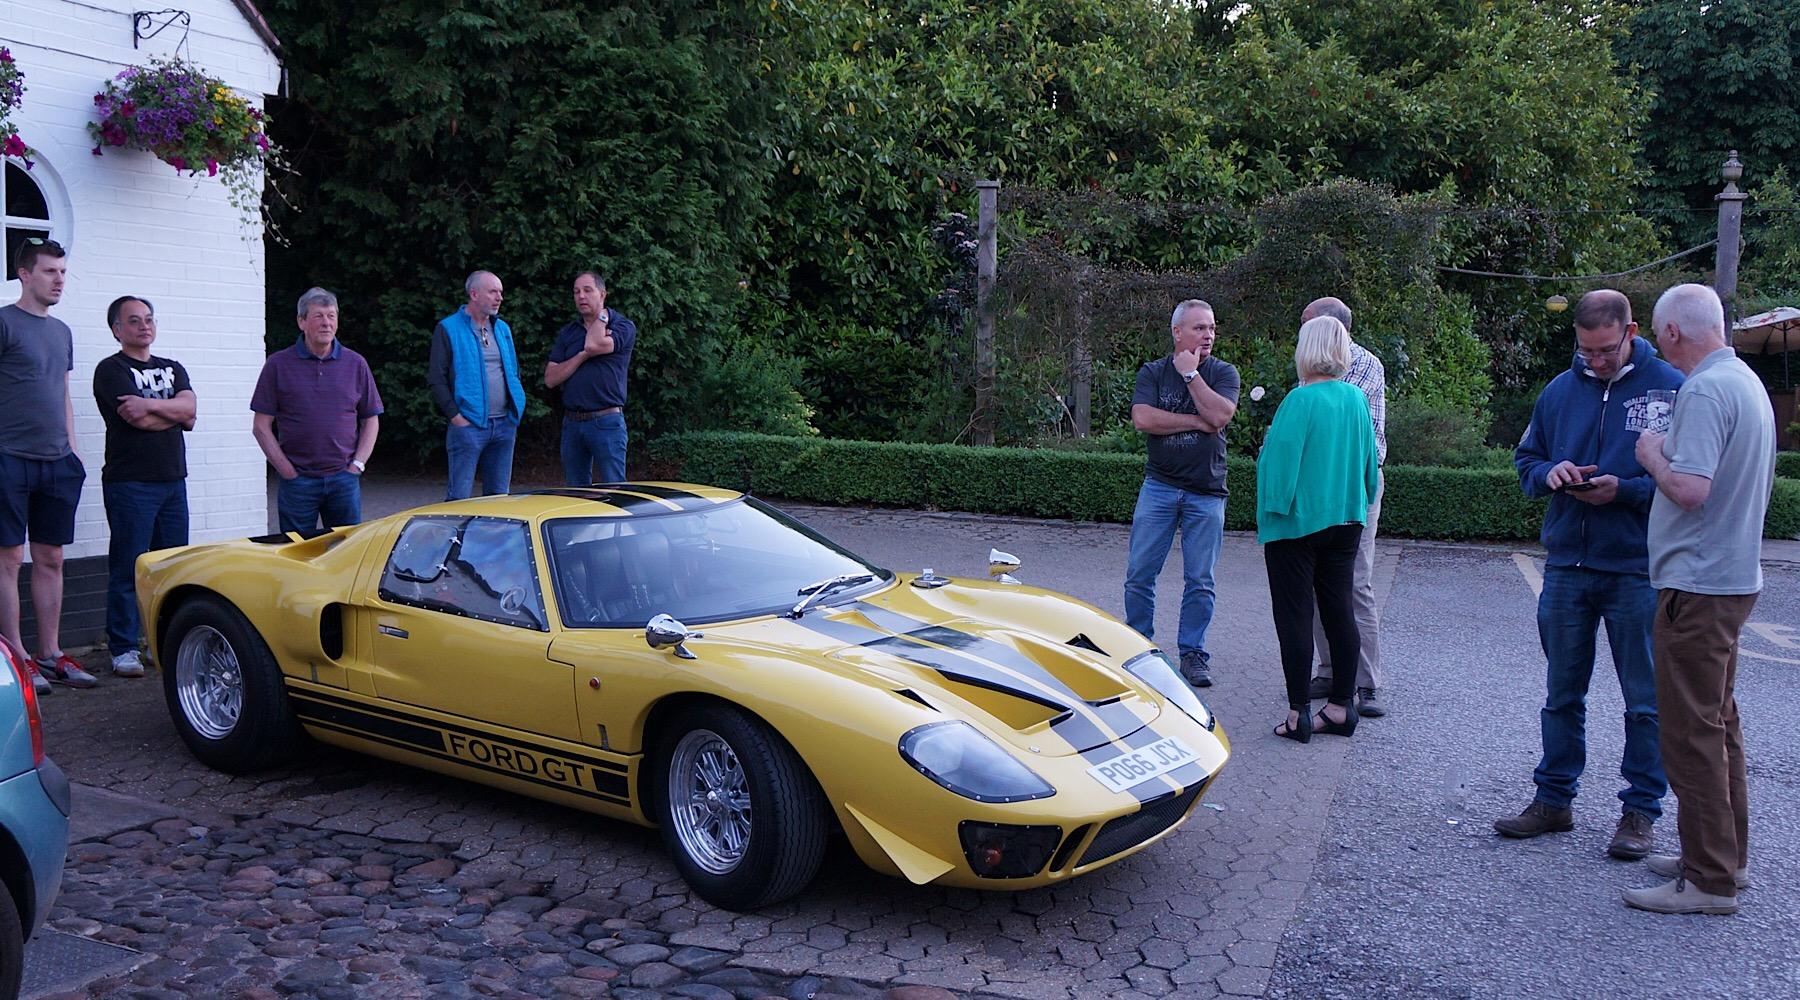 Monocoque Chassis-d0fa1a9c-56ef-496d-9208-84a8bce155f1-jpeg